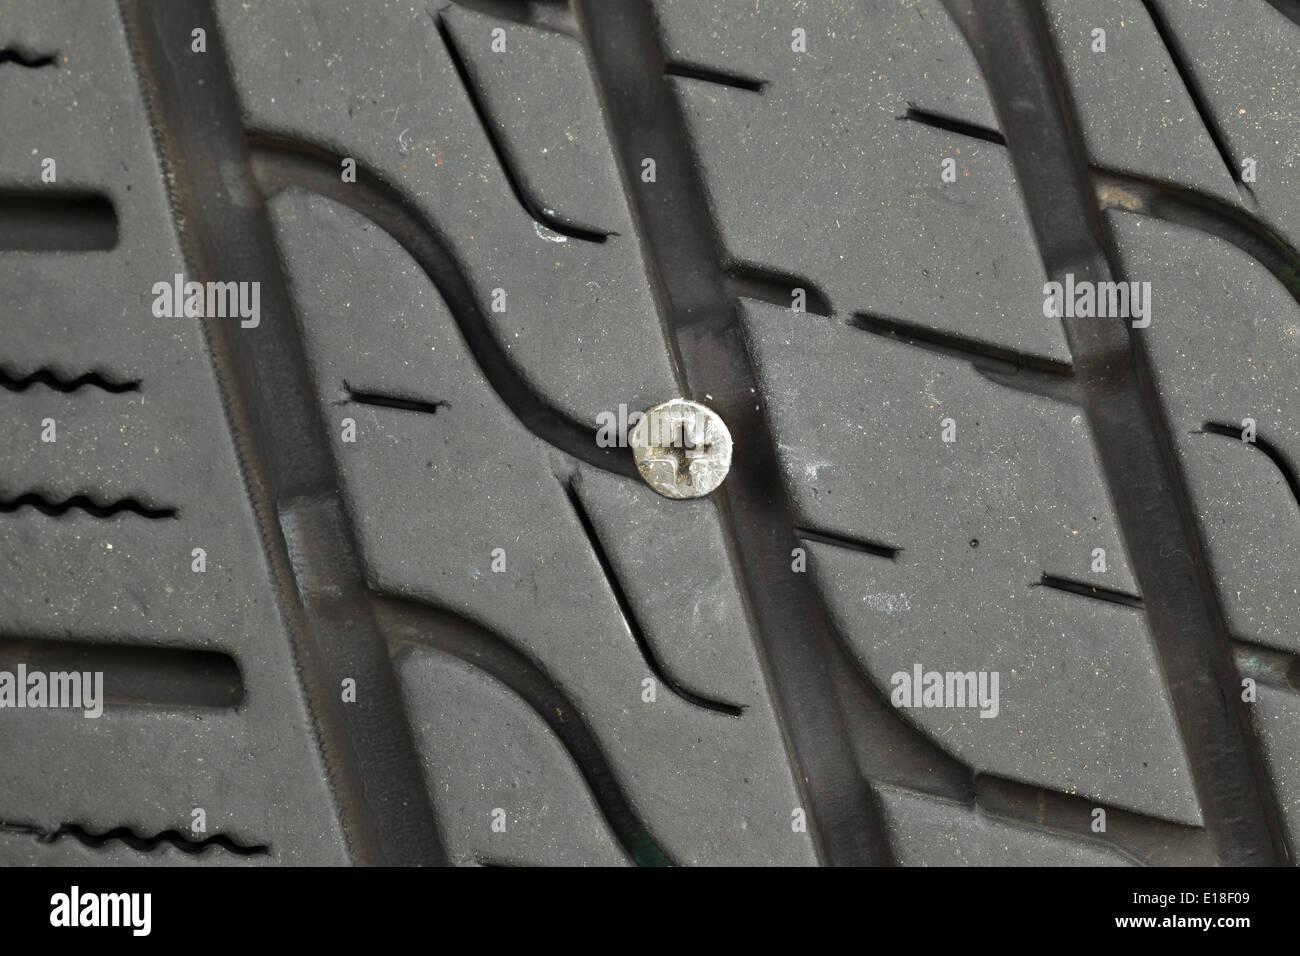 Closeup horizontal photo of wood screw embedded into car tire tread Stock Photo